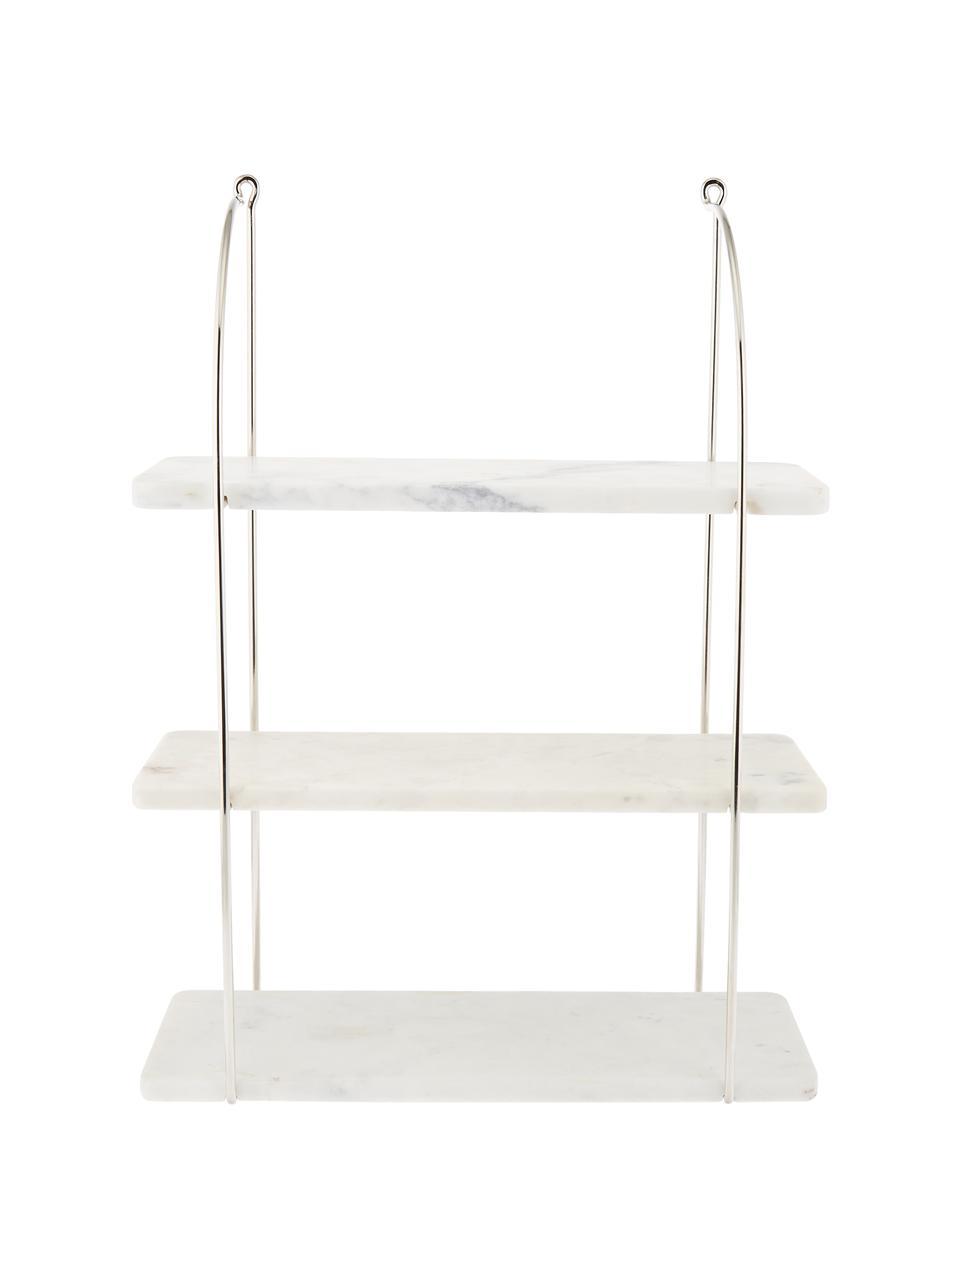 Marmor-Wandregal Porter, Regalbretter: Marmor, Wandhalterung: Edelstahl  Regalbretter: Weiß, marmoriert, 40 x 58 cm